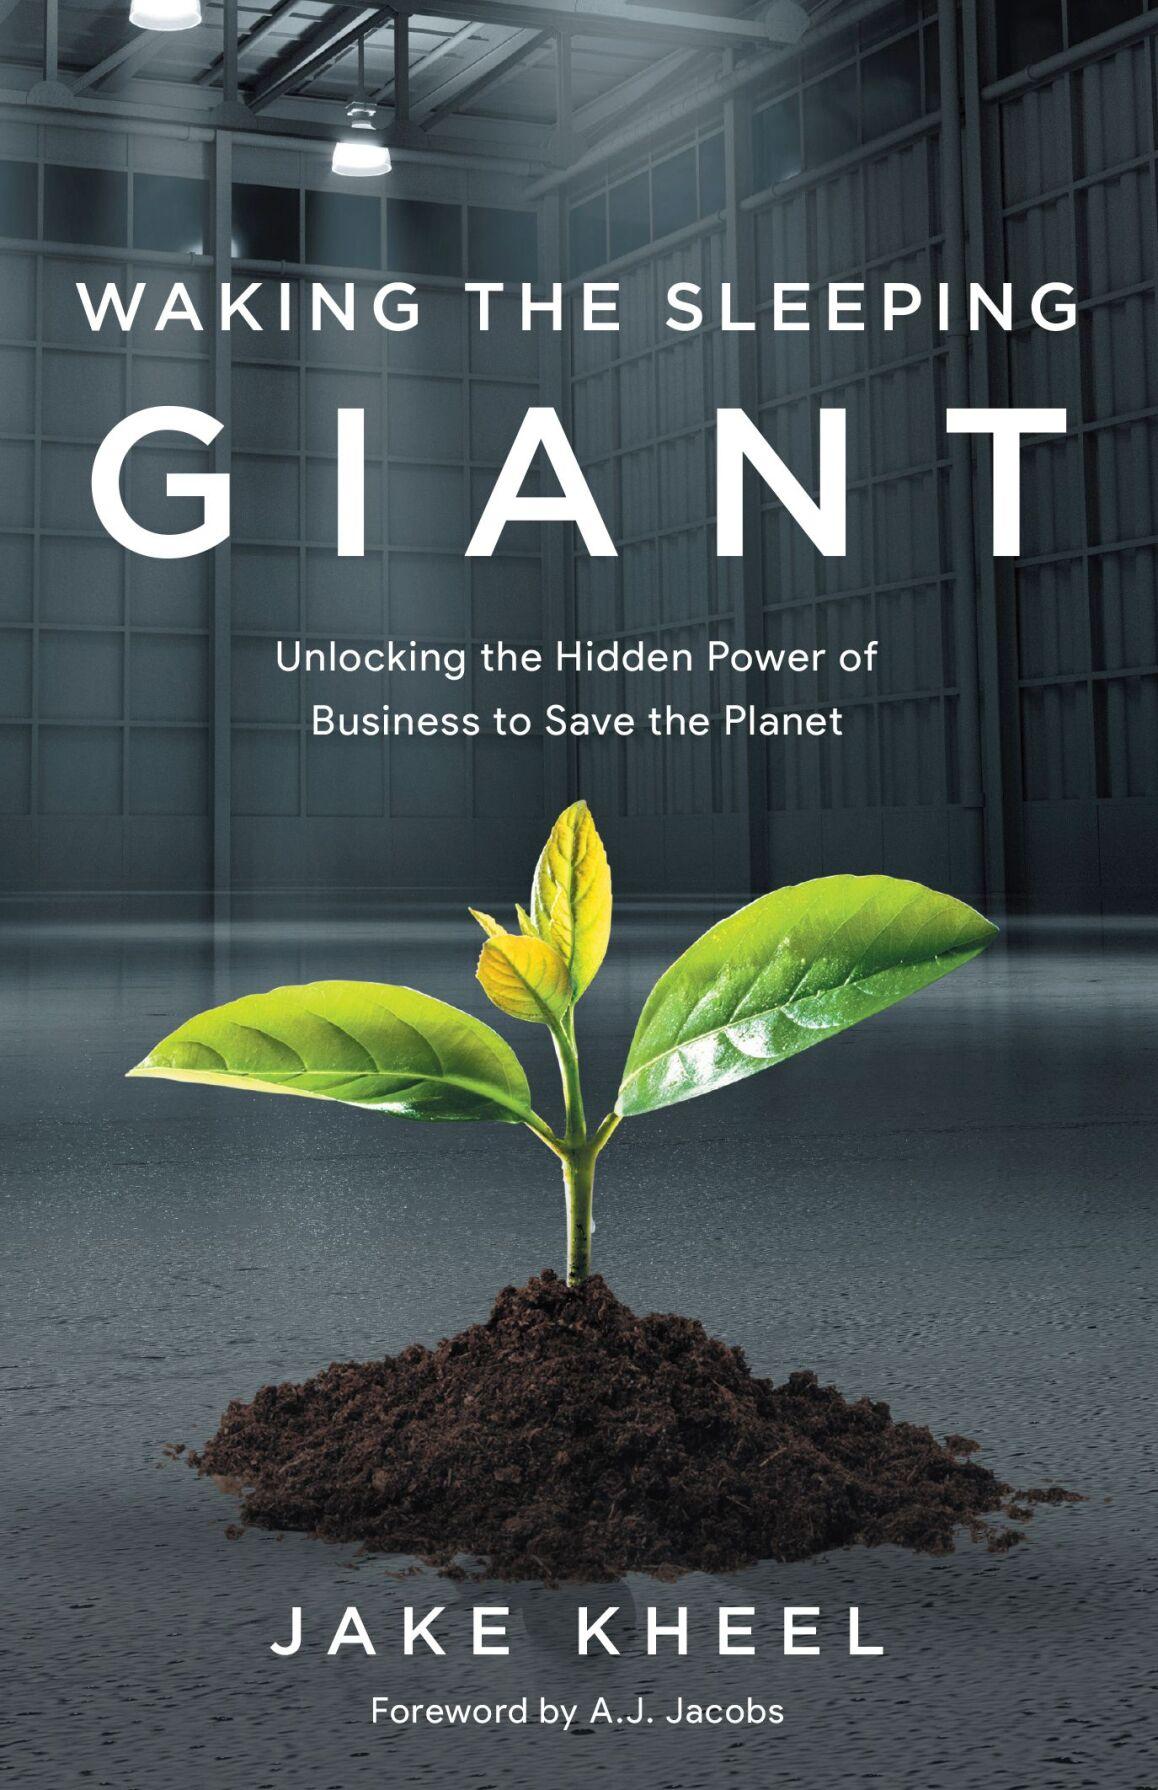 Jake Kheel's Waking the Sleeping Giant (book)